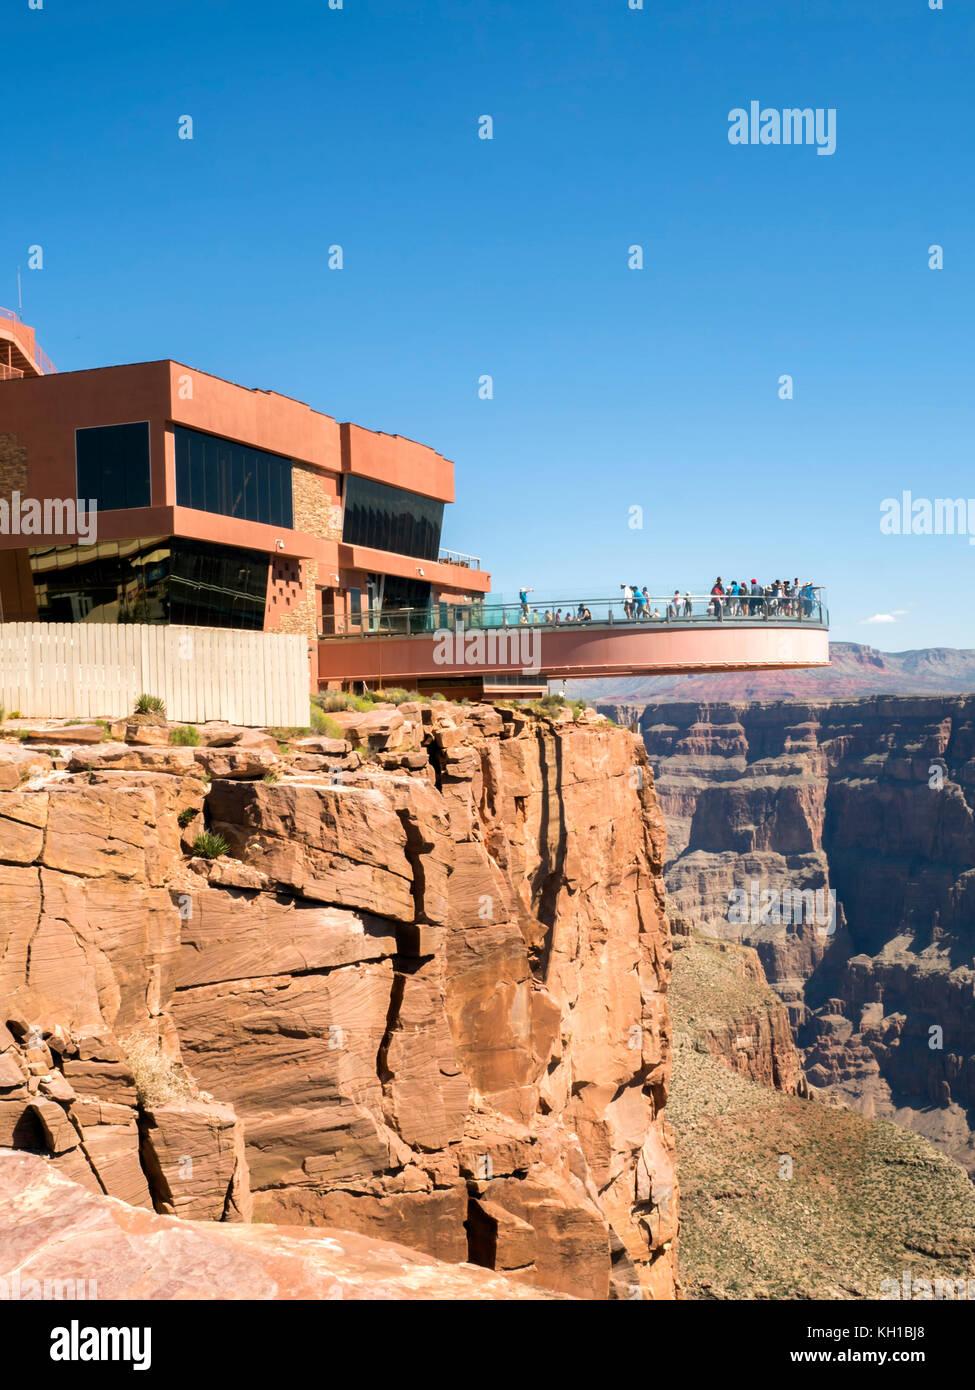 Skywalk Grand Canyon West Rim - Arizona, AZ, USA - Stock Image